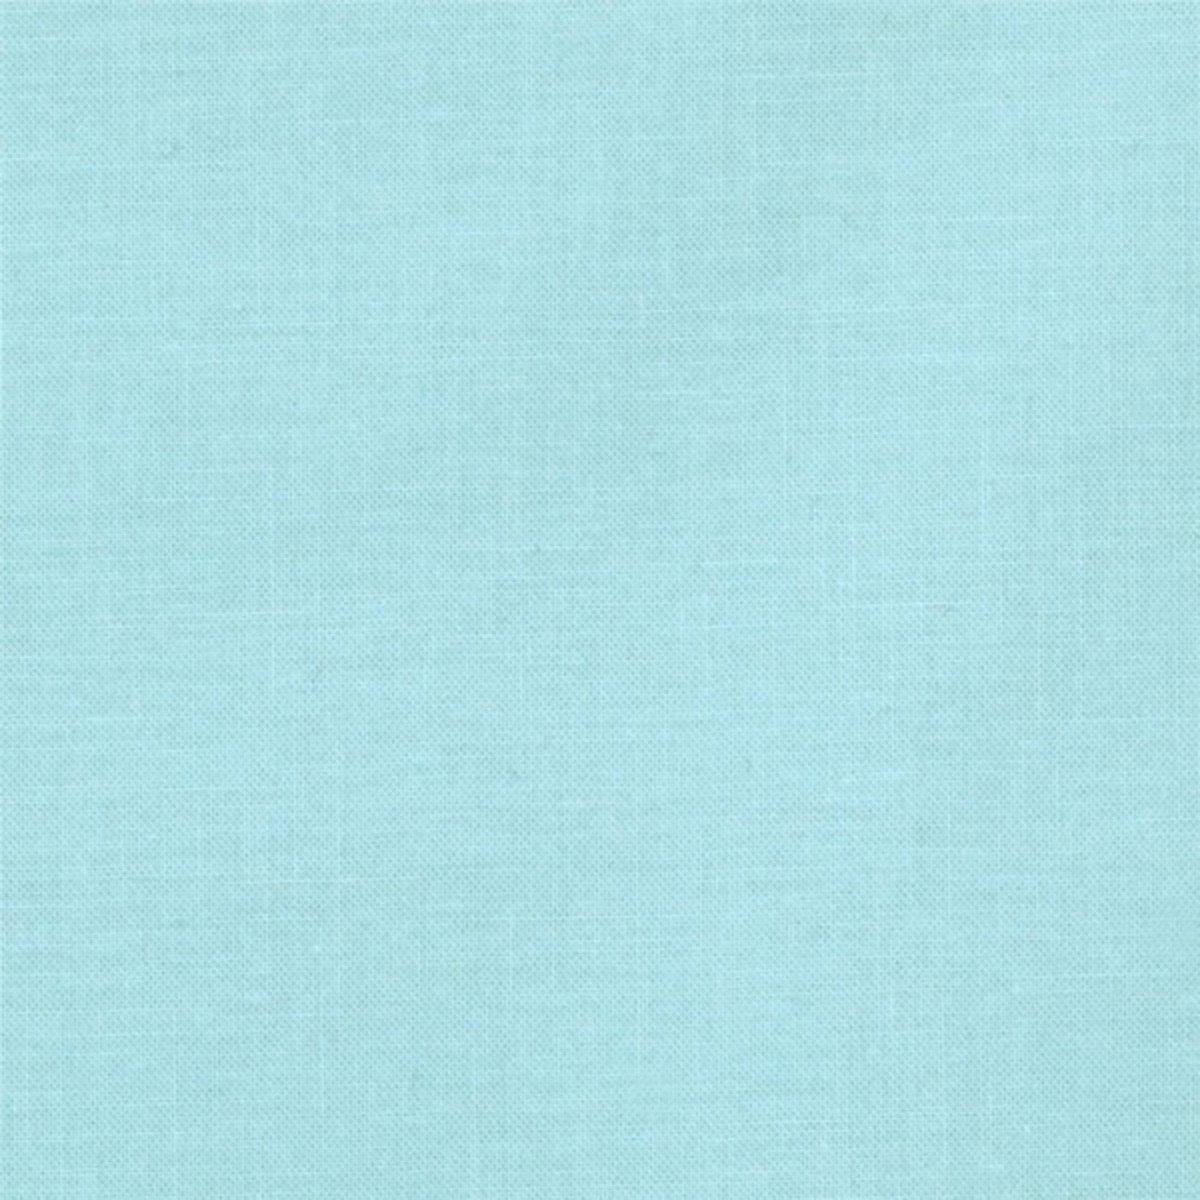 Kona Cotton in Baby Blue for Robert Kaufman